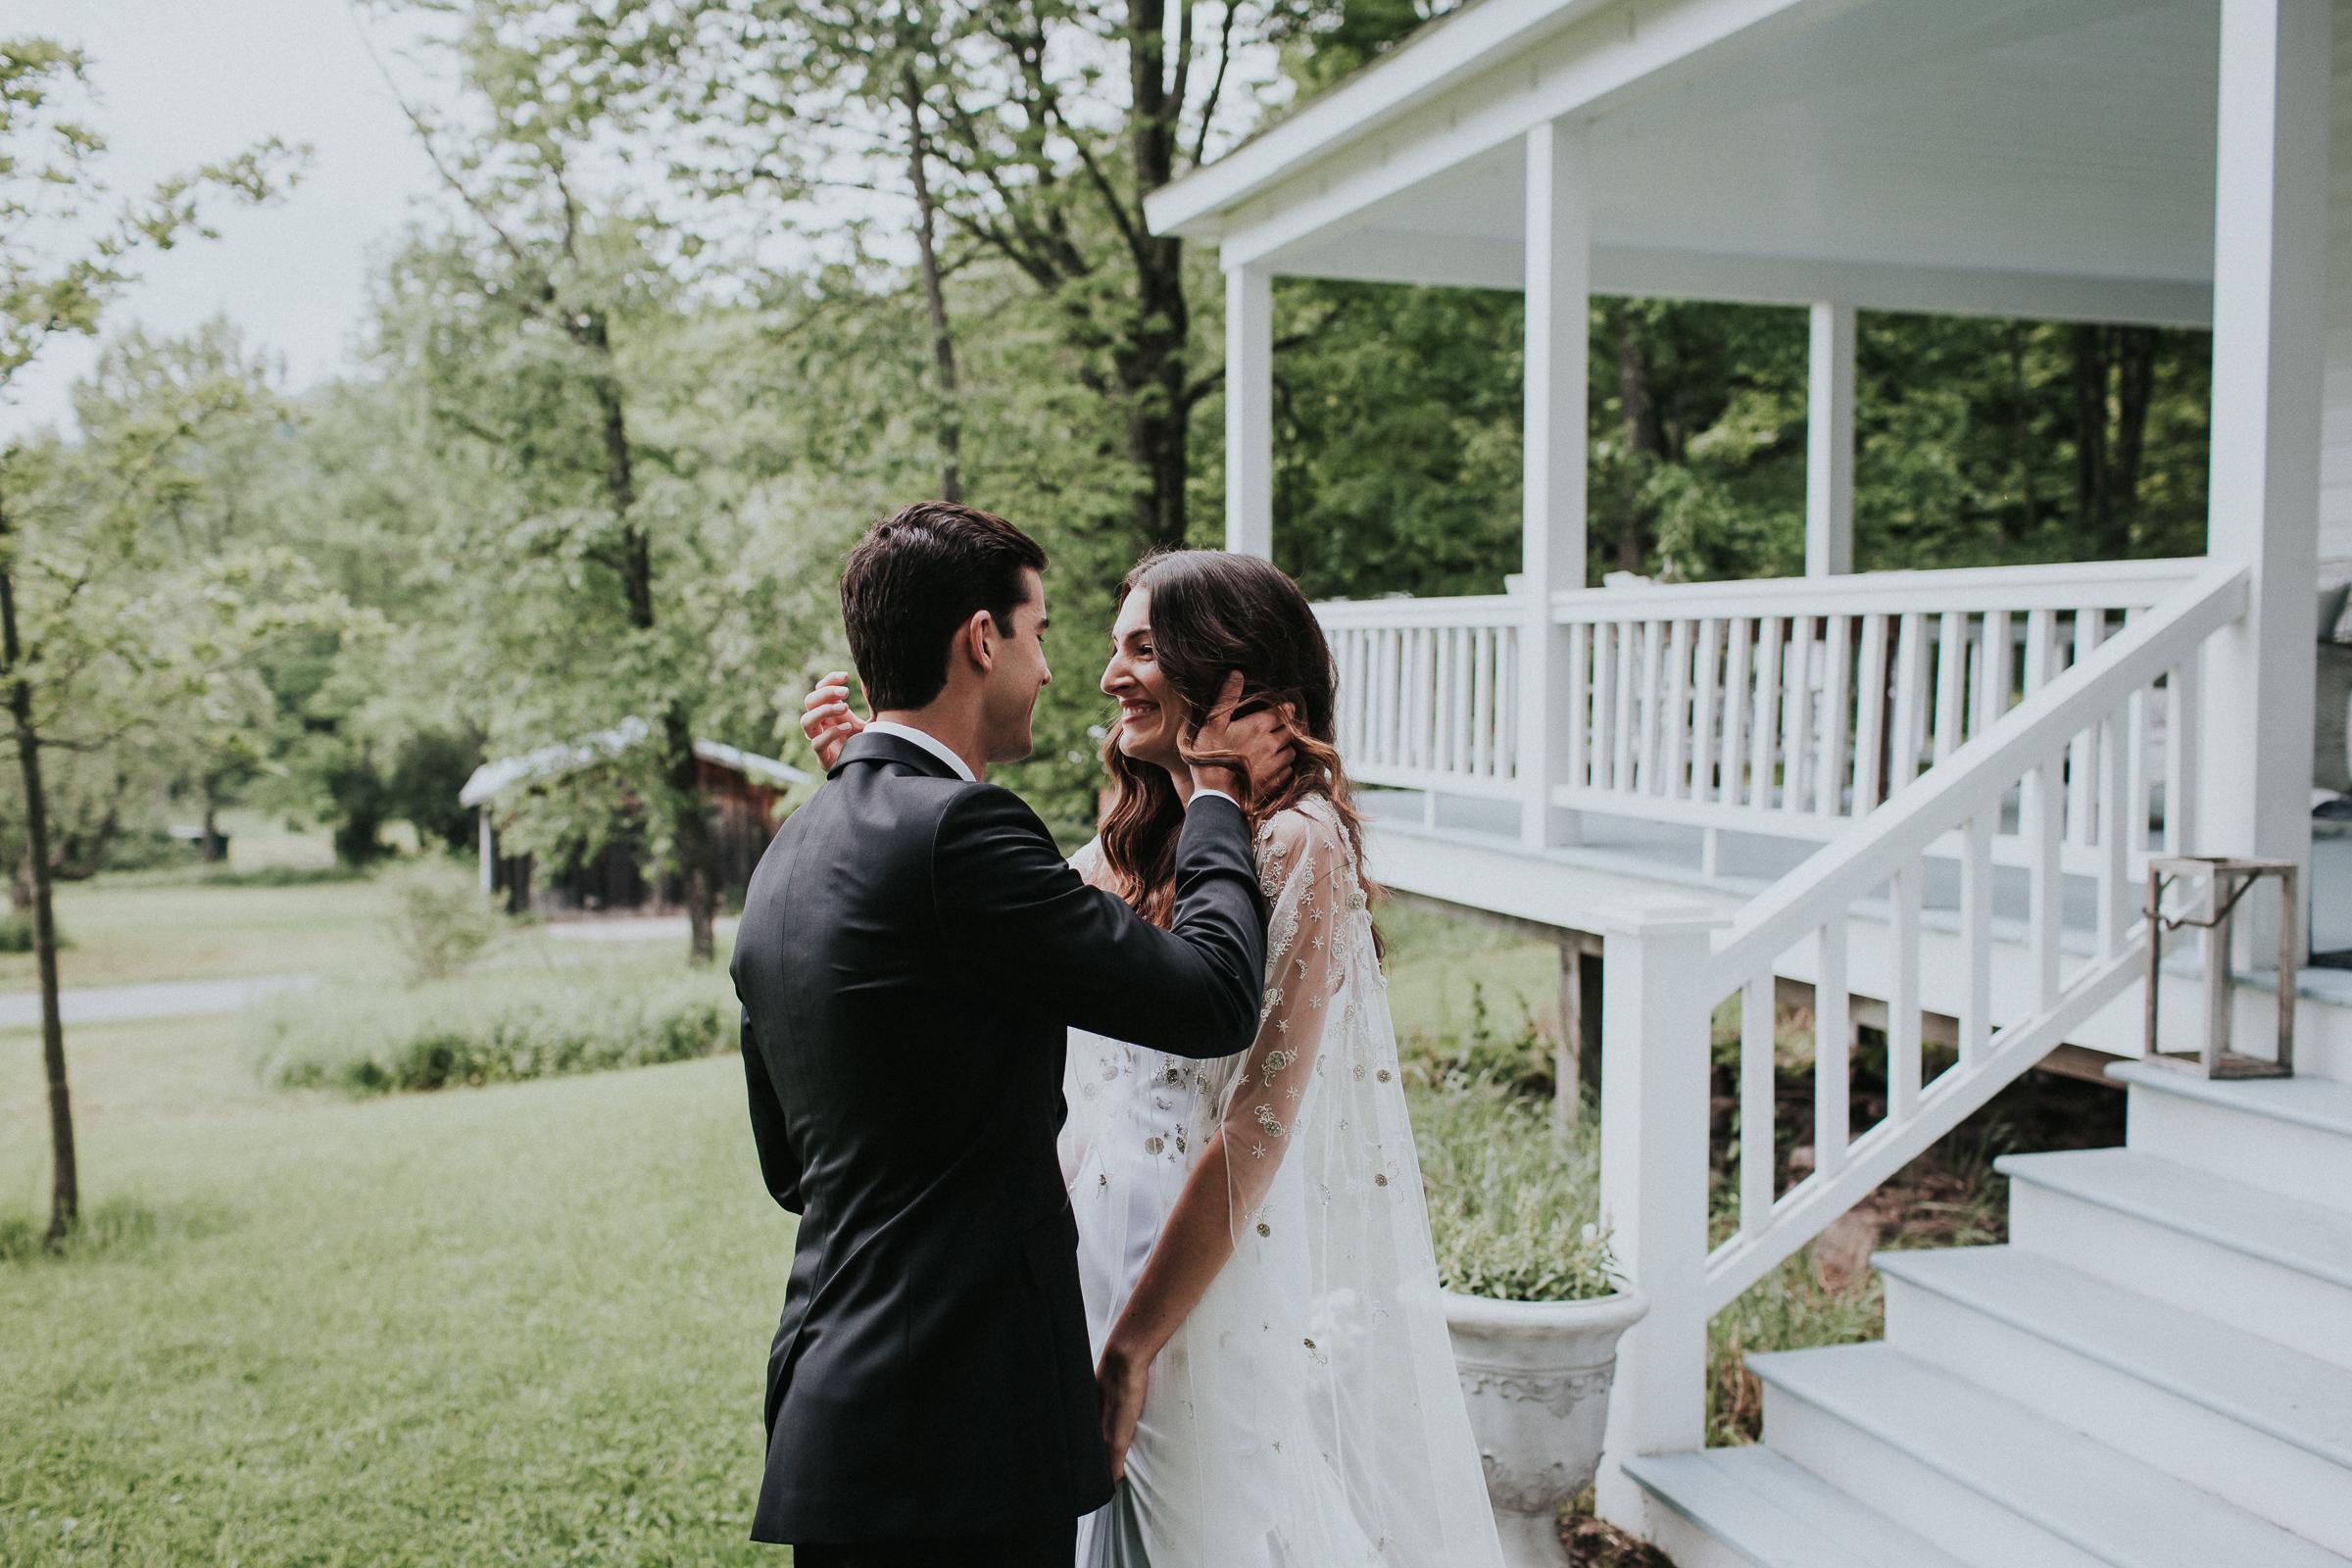 Handsome-Hollow-Long-Eddy-Catskills-New-York-Fine-Art-Documentary-Wedding-Photographer-28.jpg